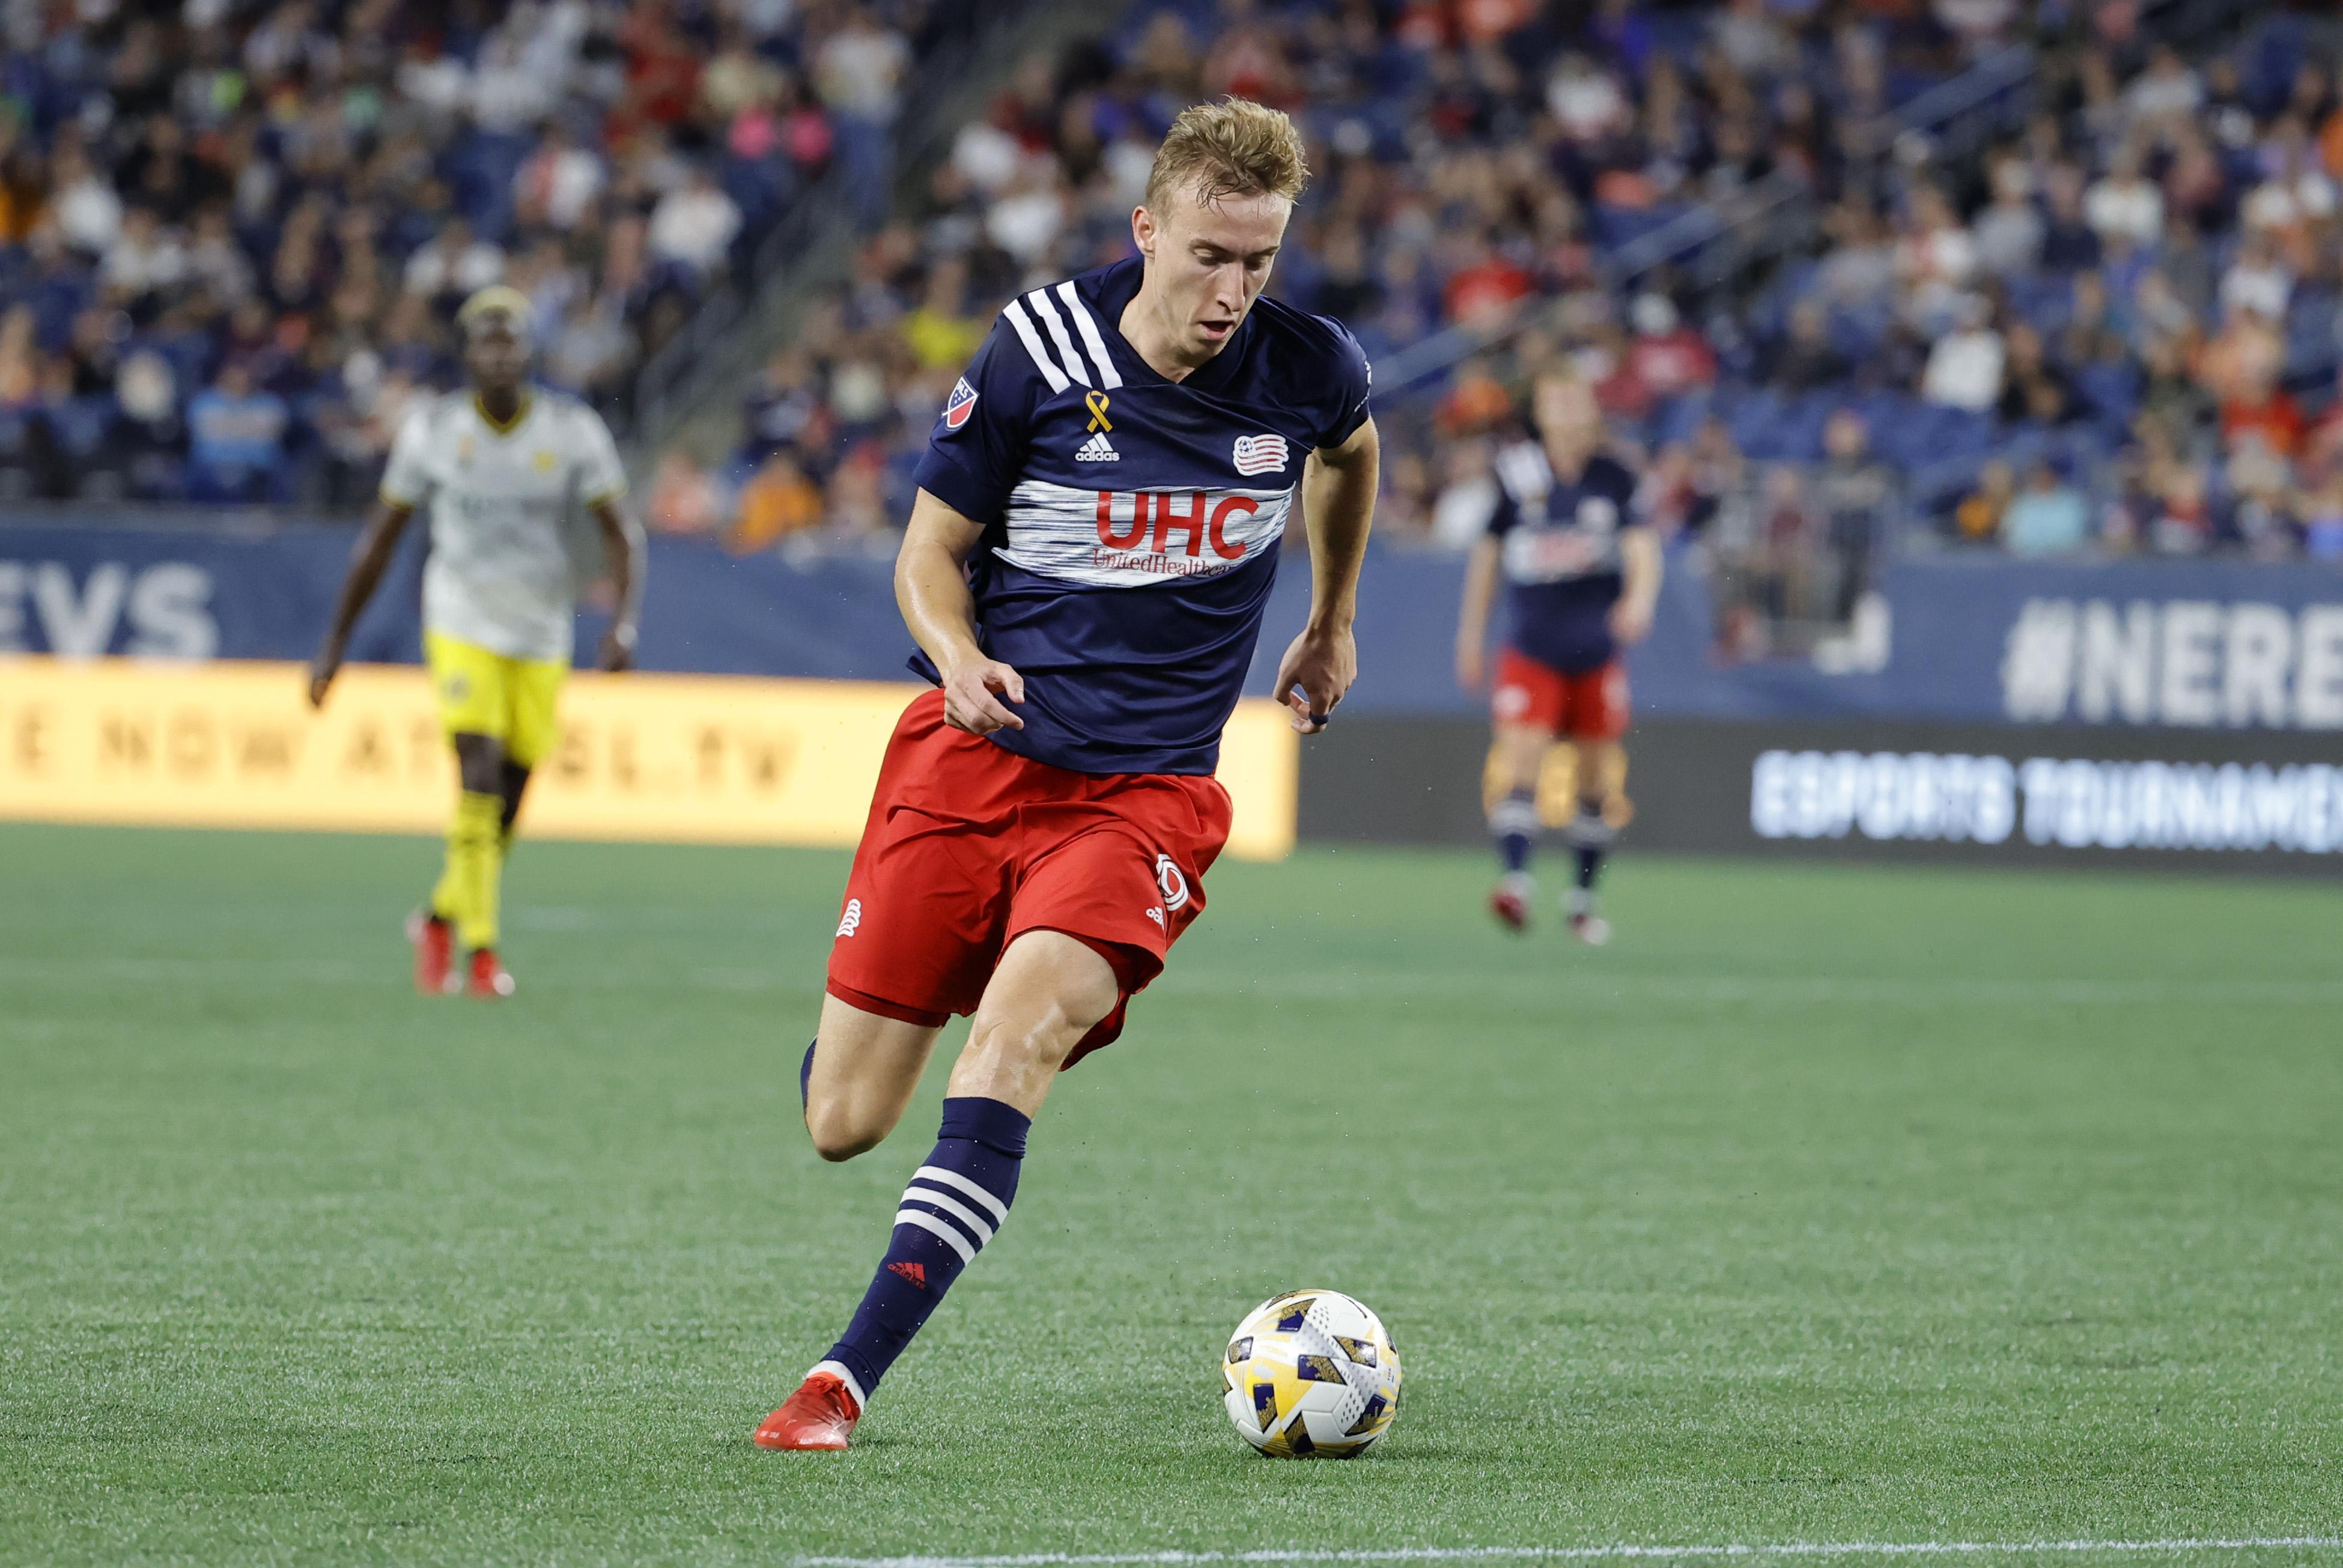 SOCCER: SEP 18 MLS - Columbus Crew SC at New England Revolution